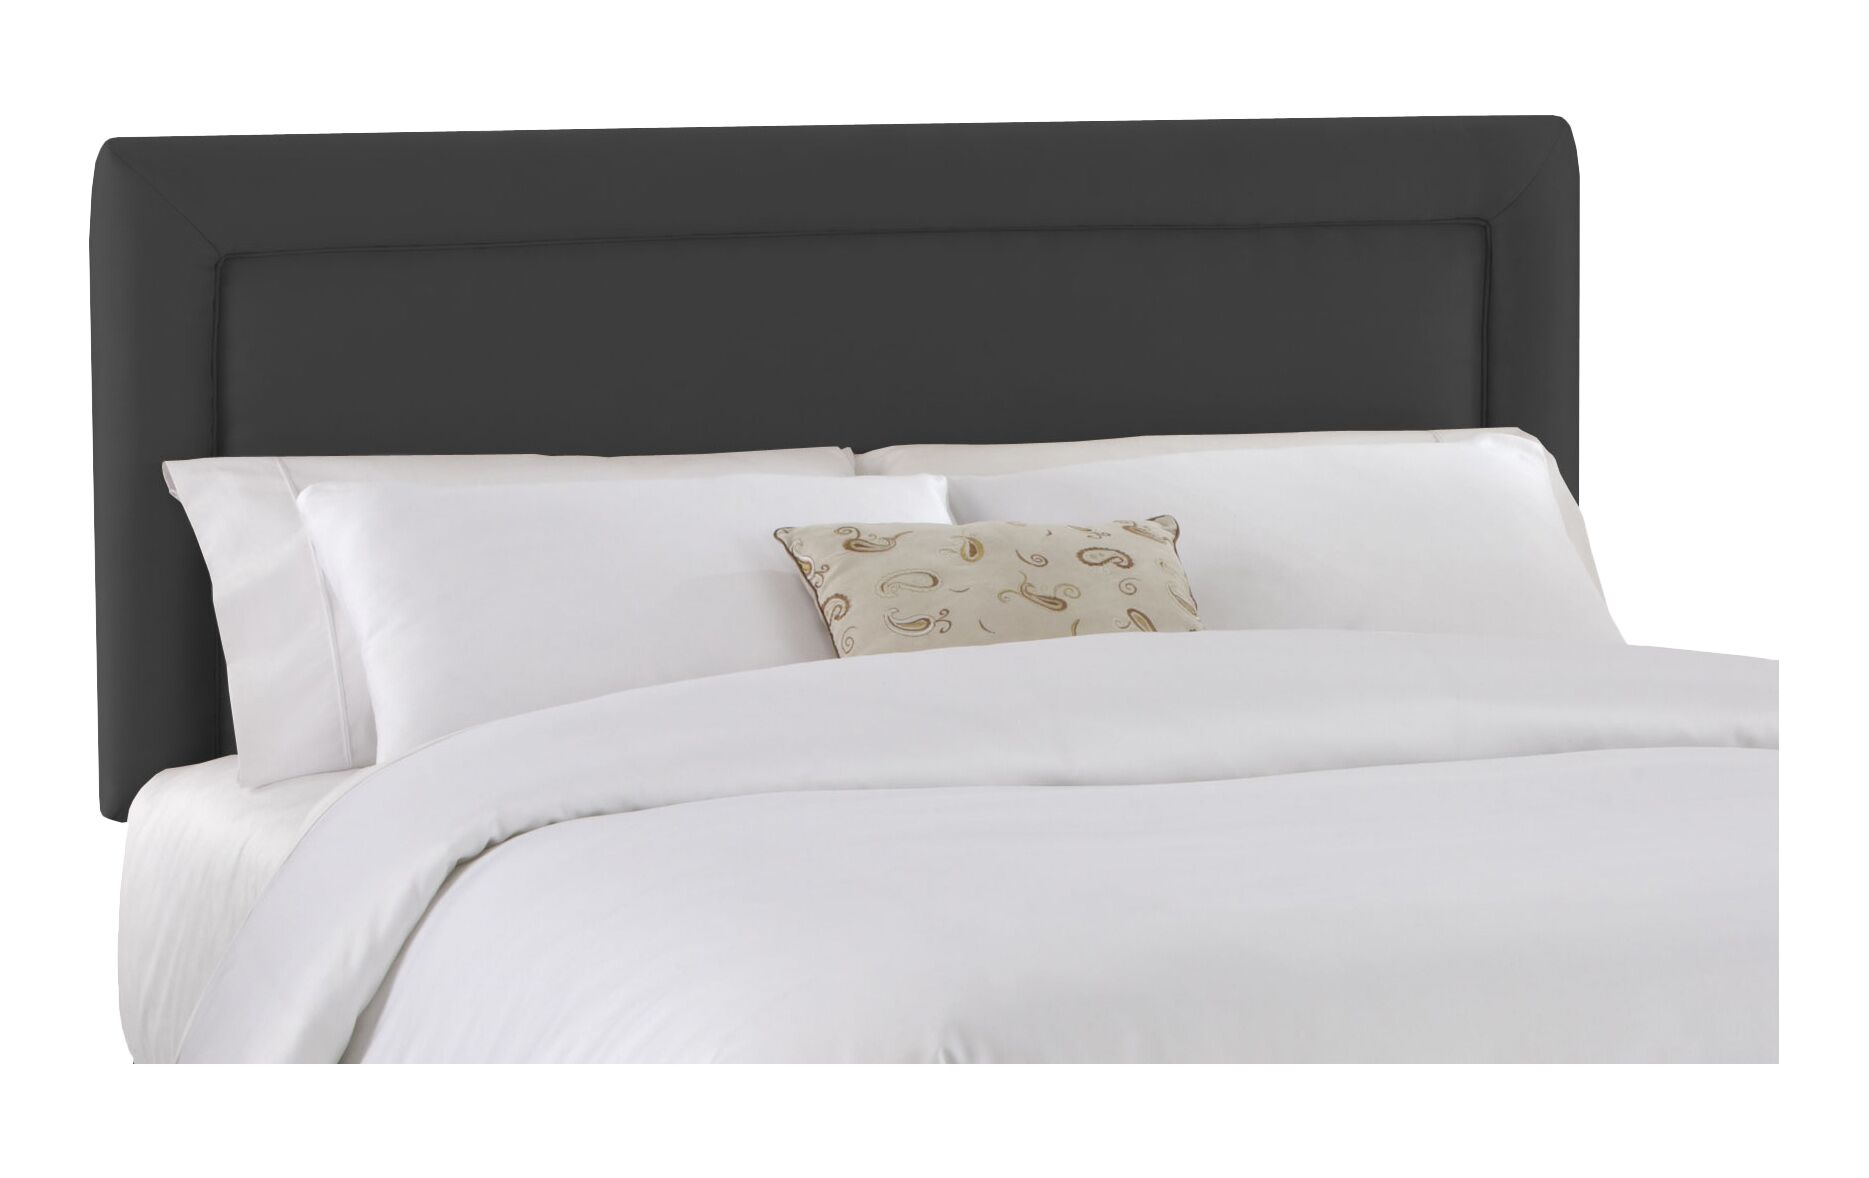 Border Upholstered Panel Headboard Size: Queen, Color: Black